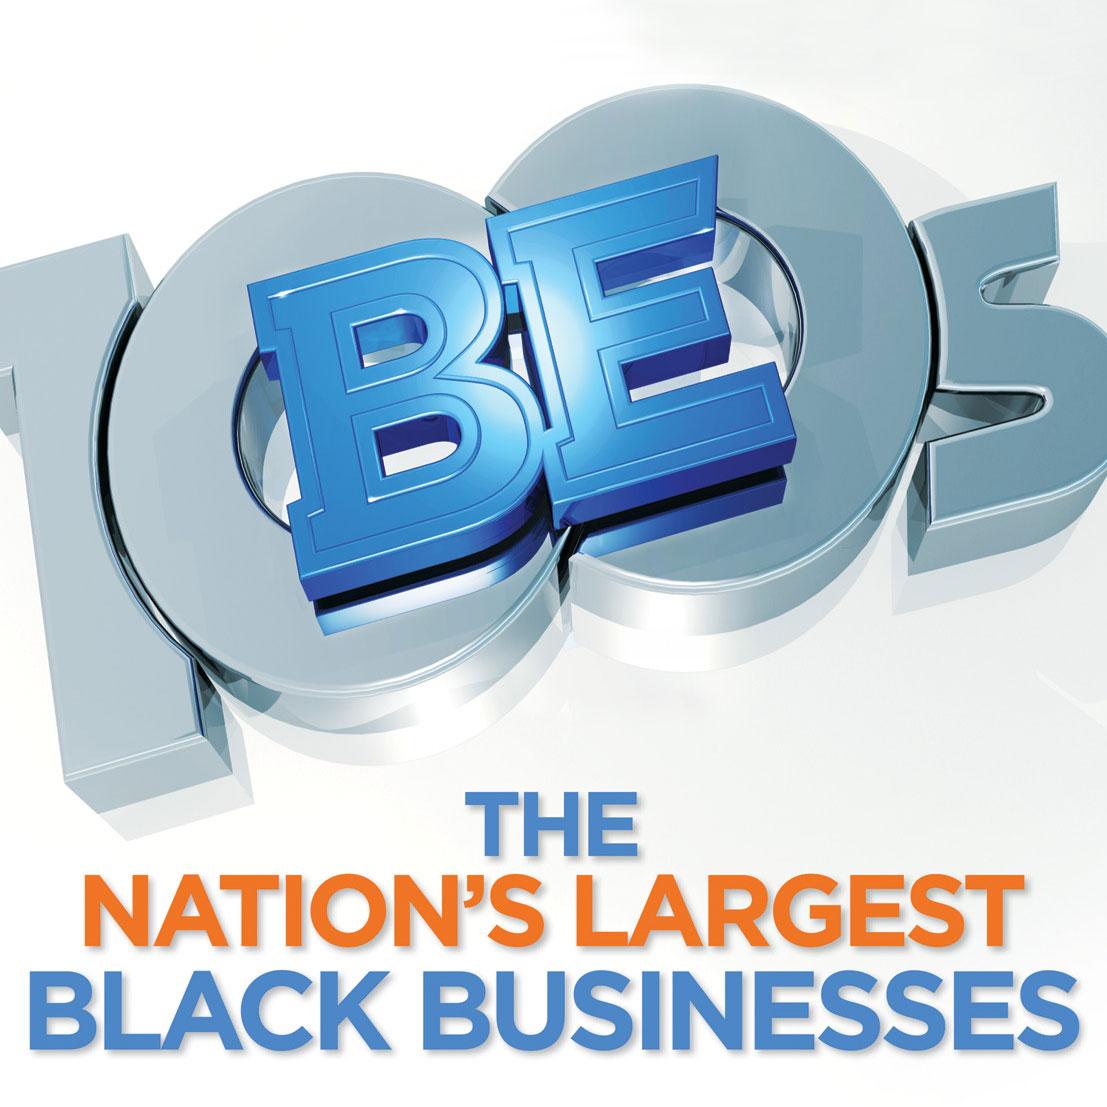 The 2009 Black Enterprise 100s